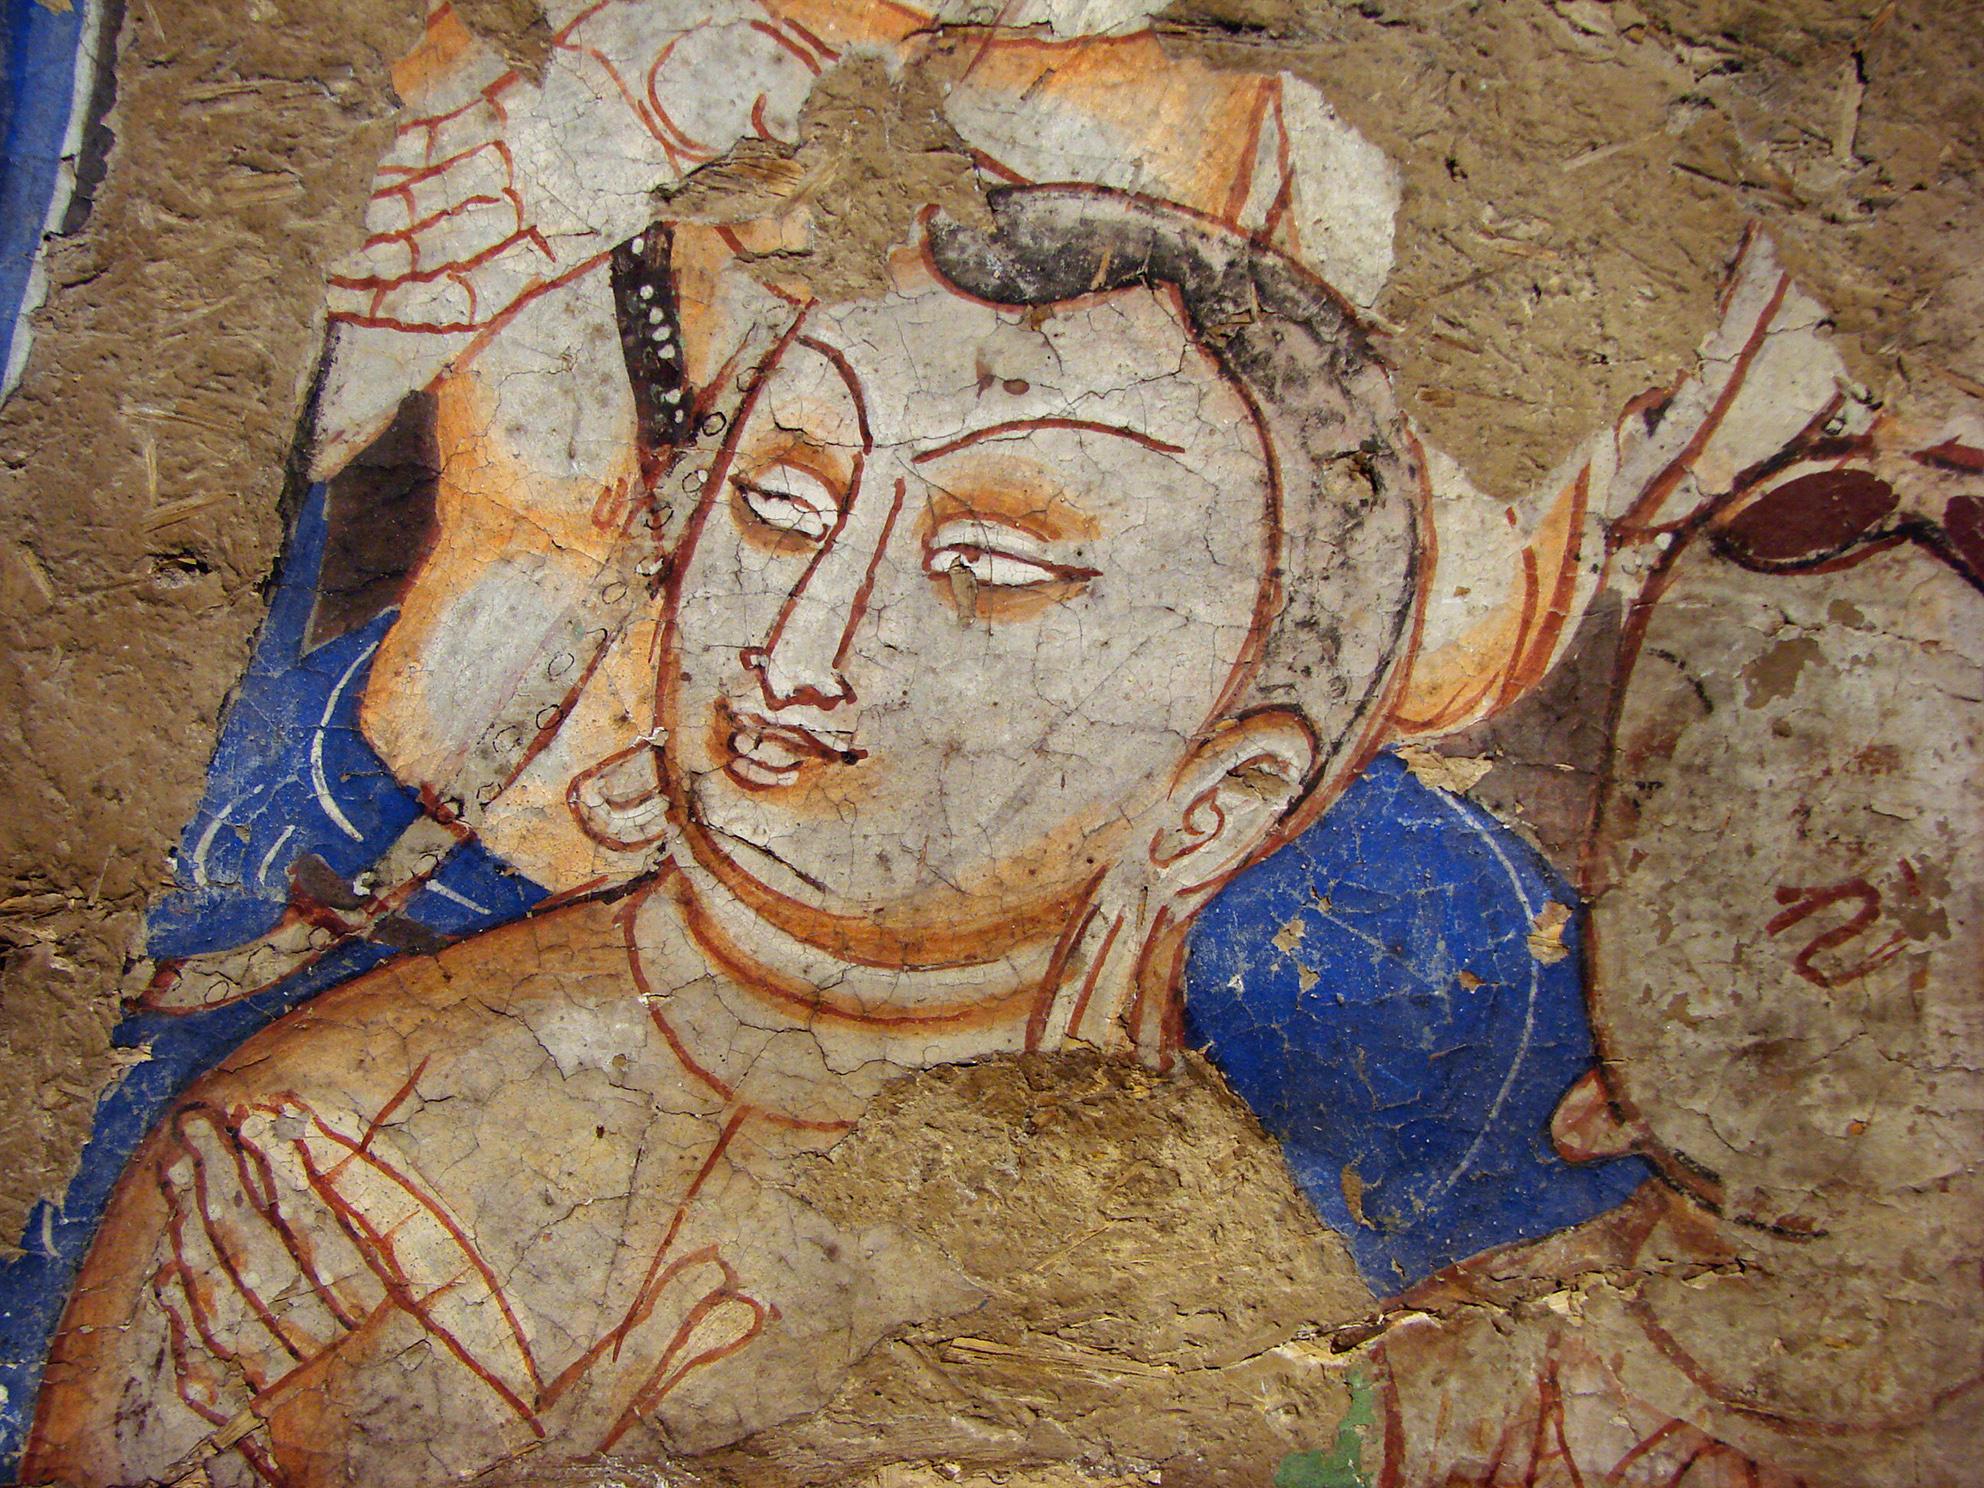 File:Peinture murale Guimet 151107 2.jpg - Wikimedia Commons